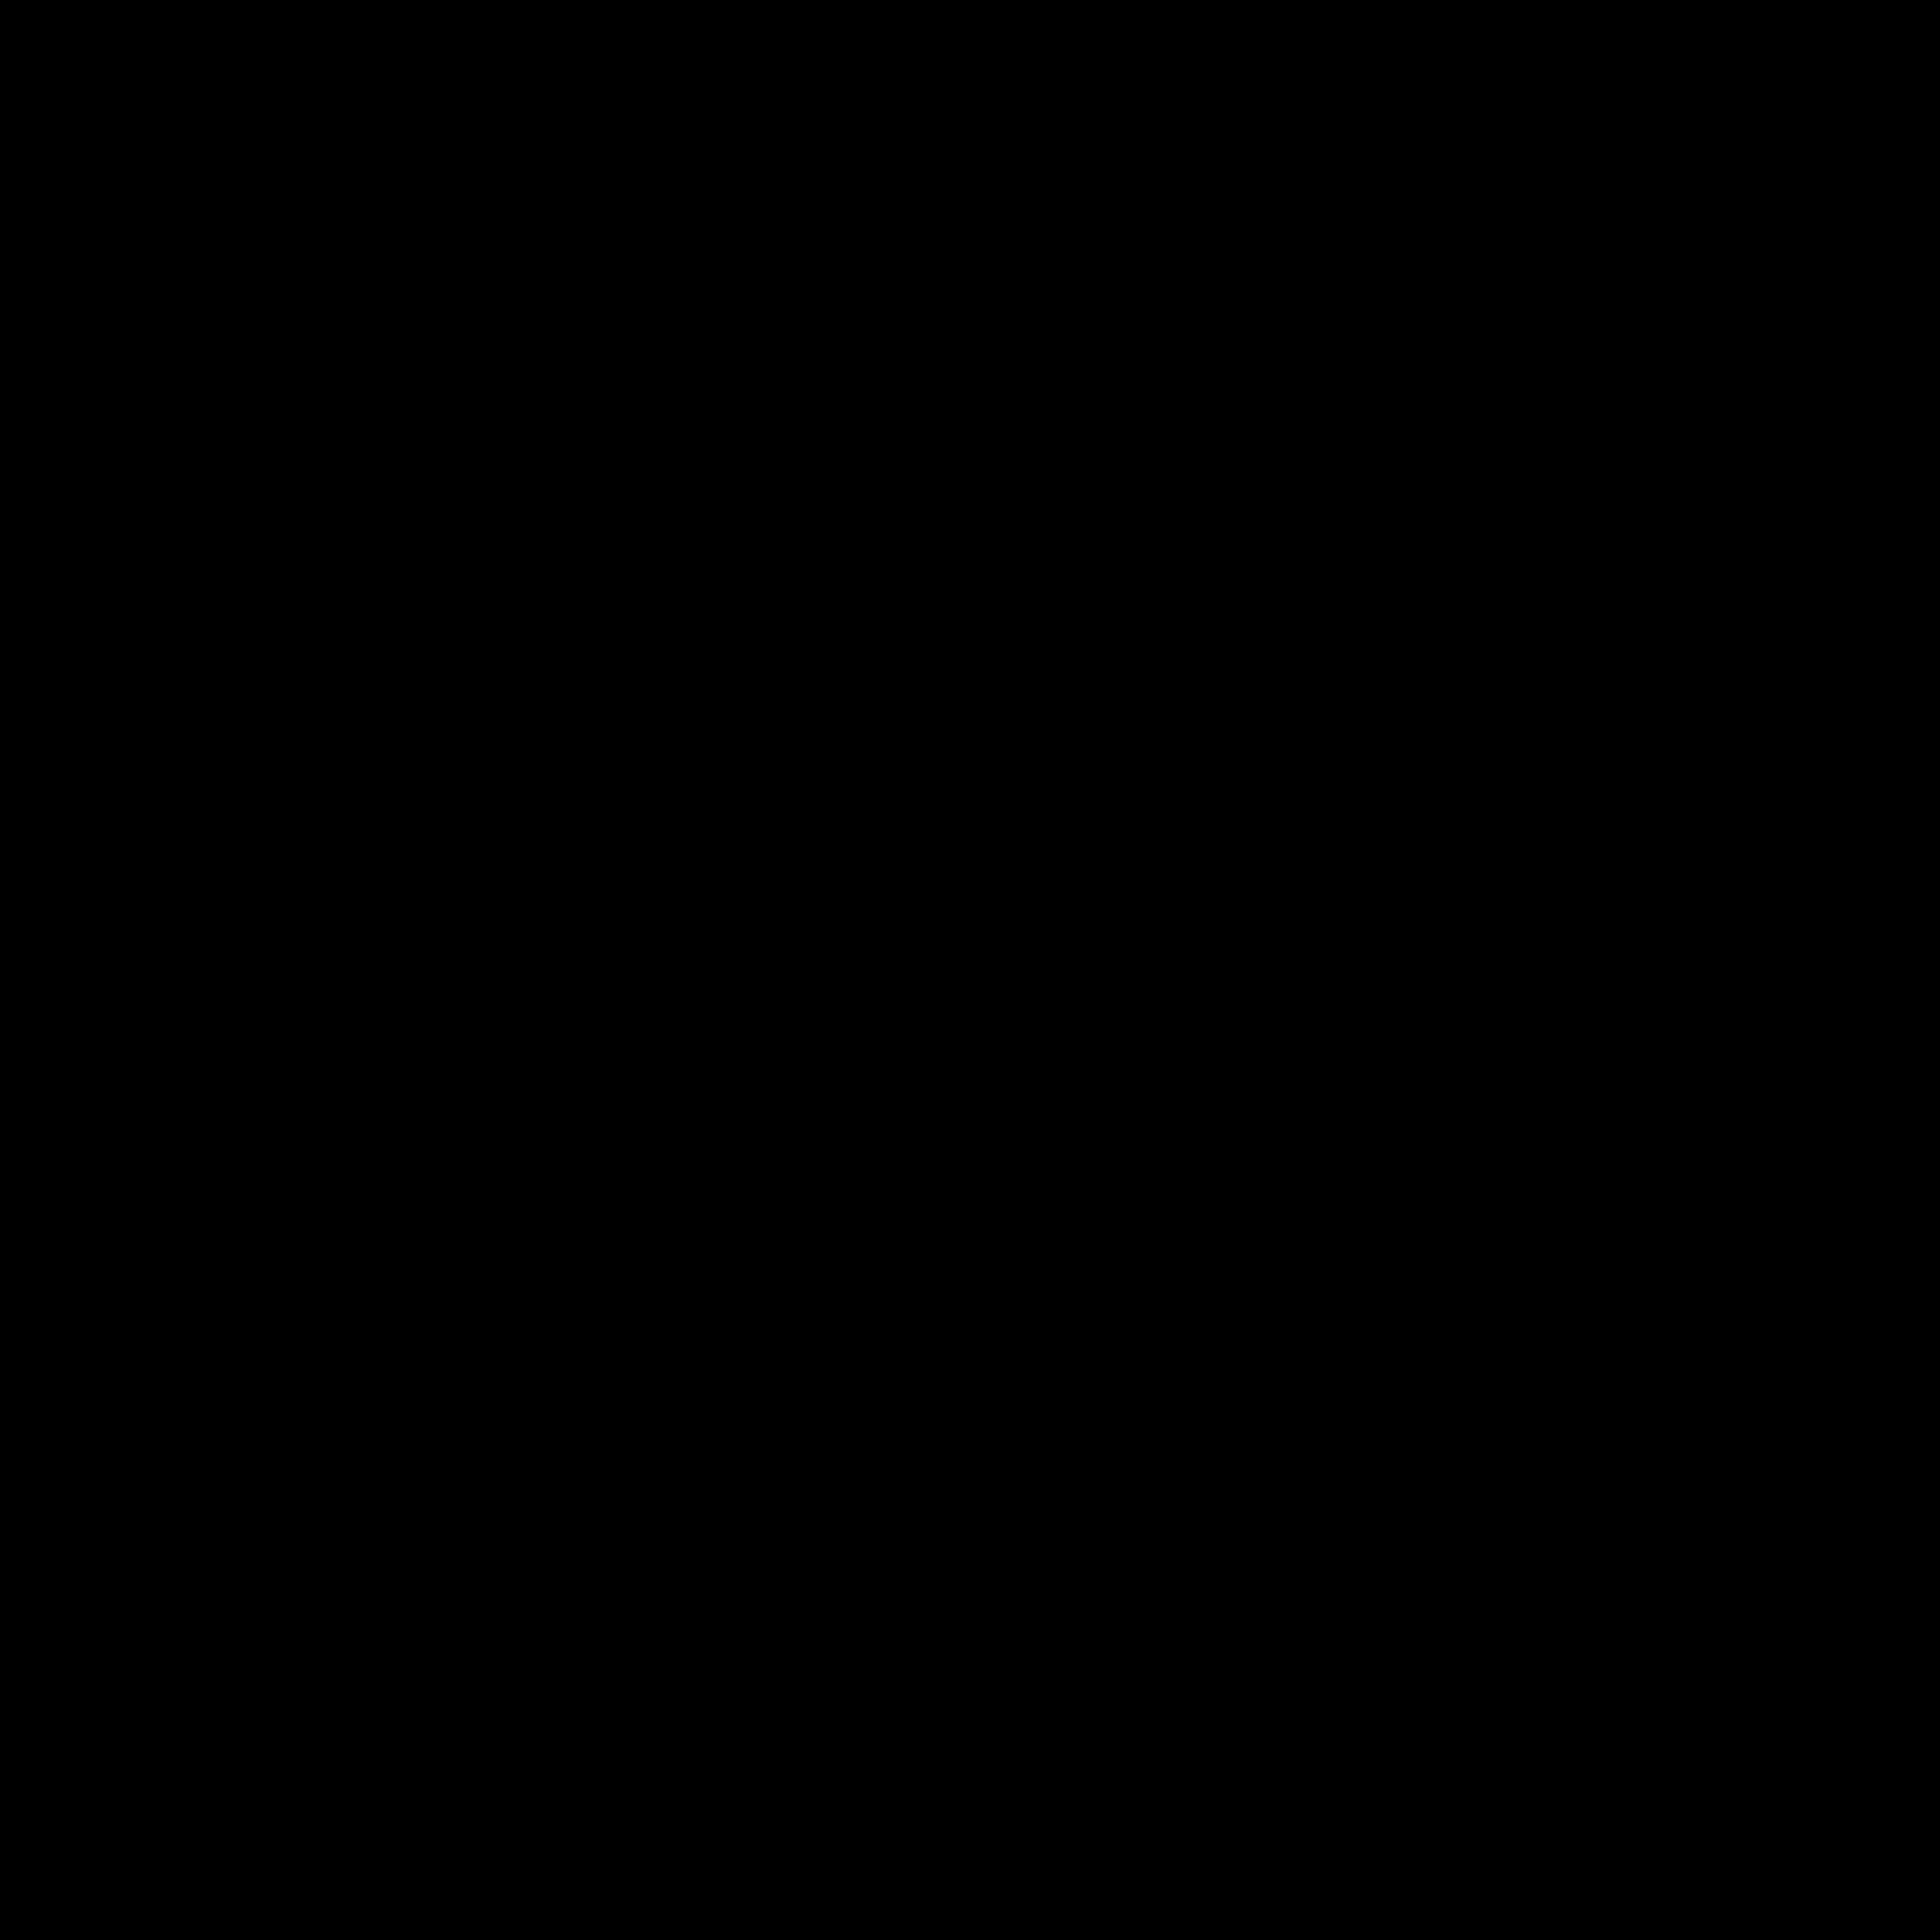 partner_logos-05.png